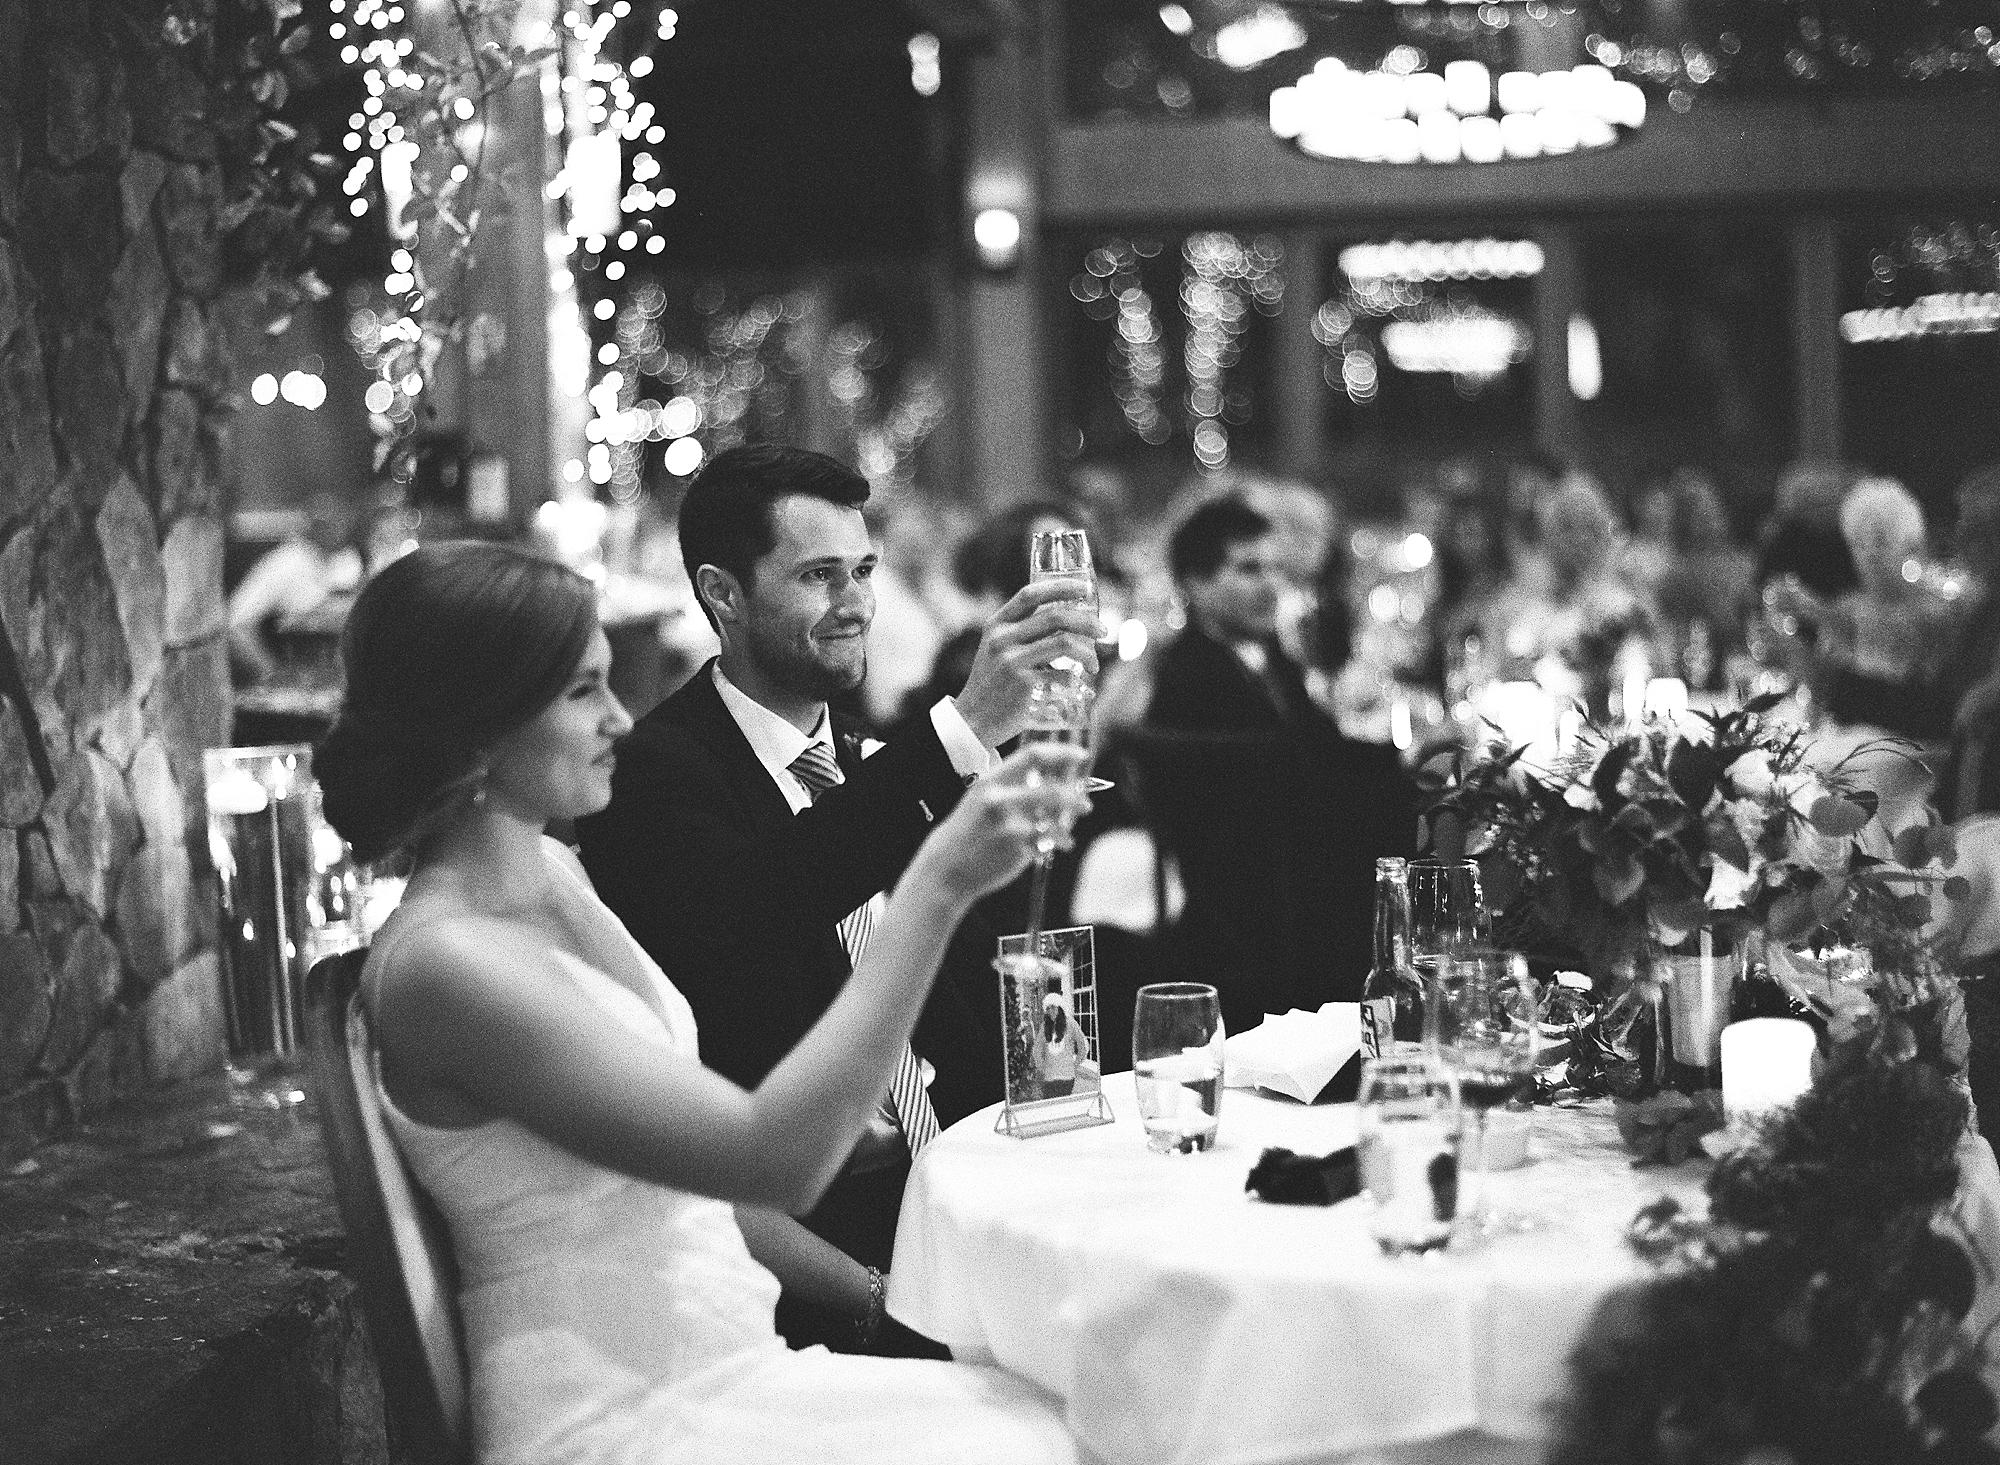 Angus-Barn-Pavilion-Raleigh-Wedding-Film-Photographer_0189.jpg